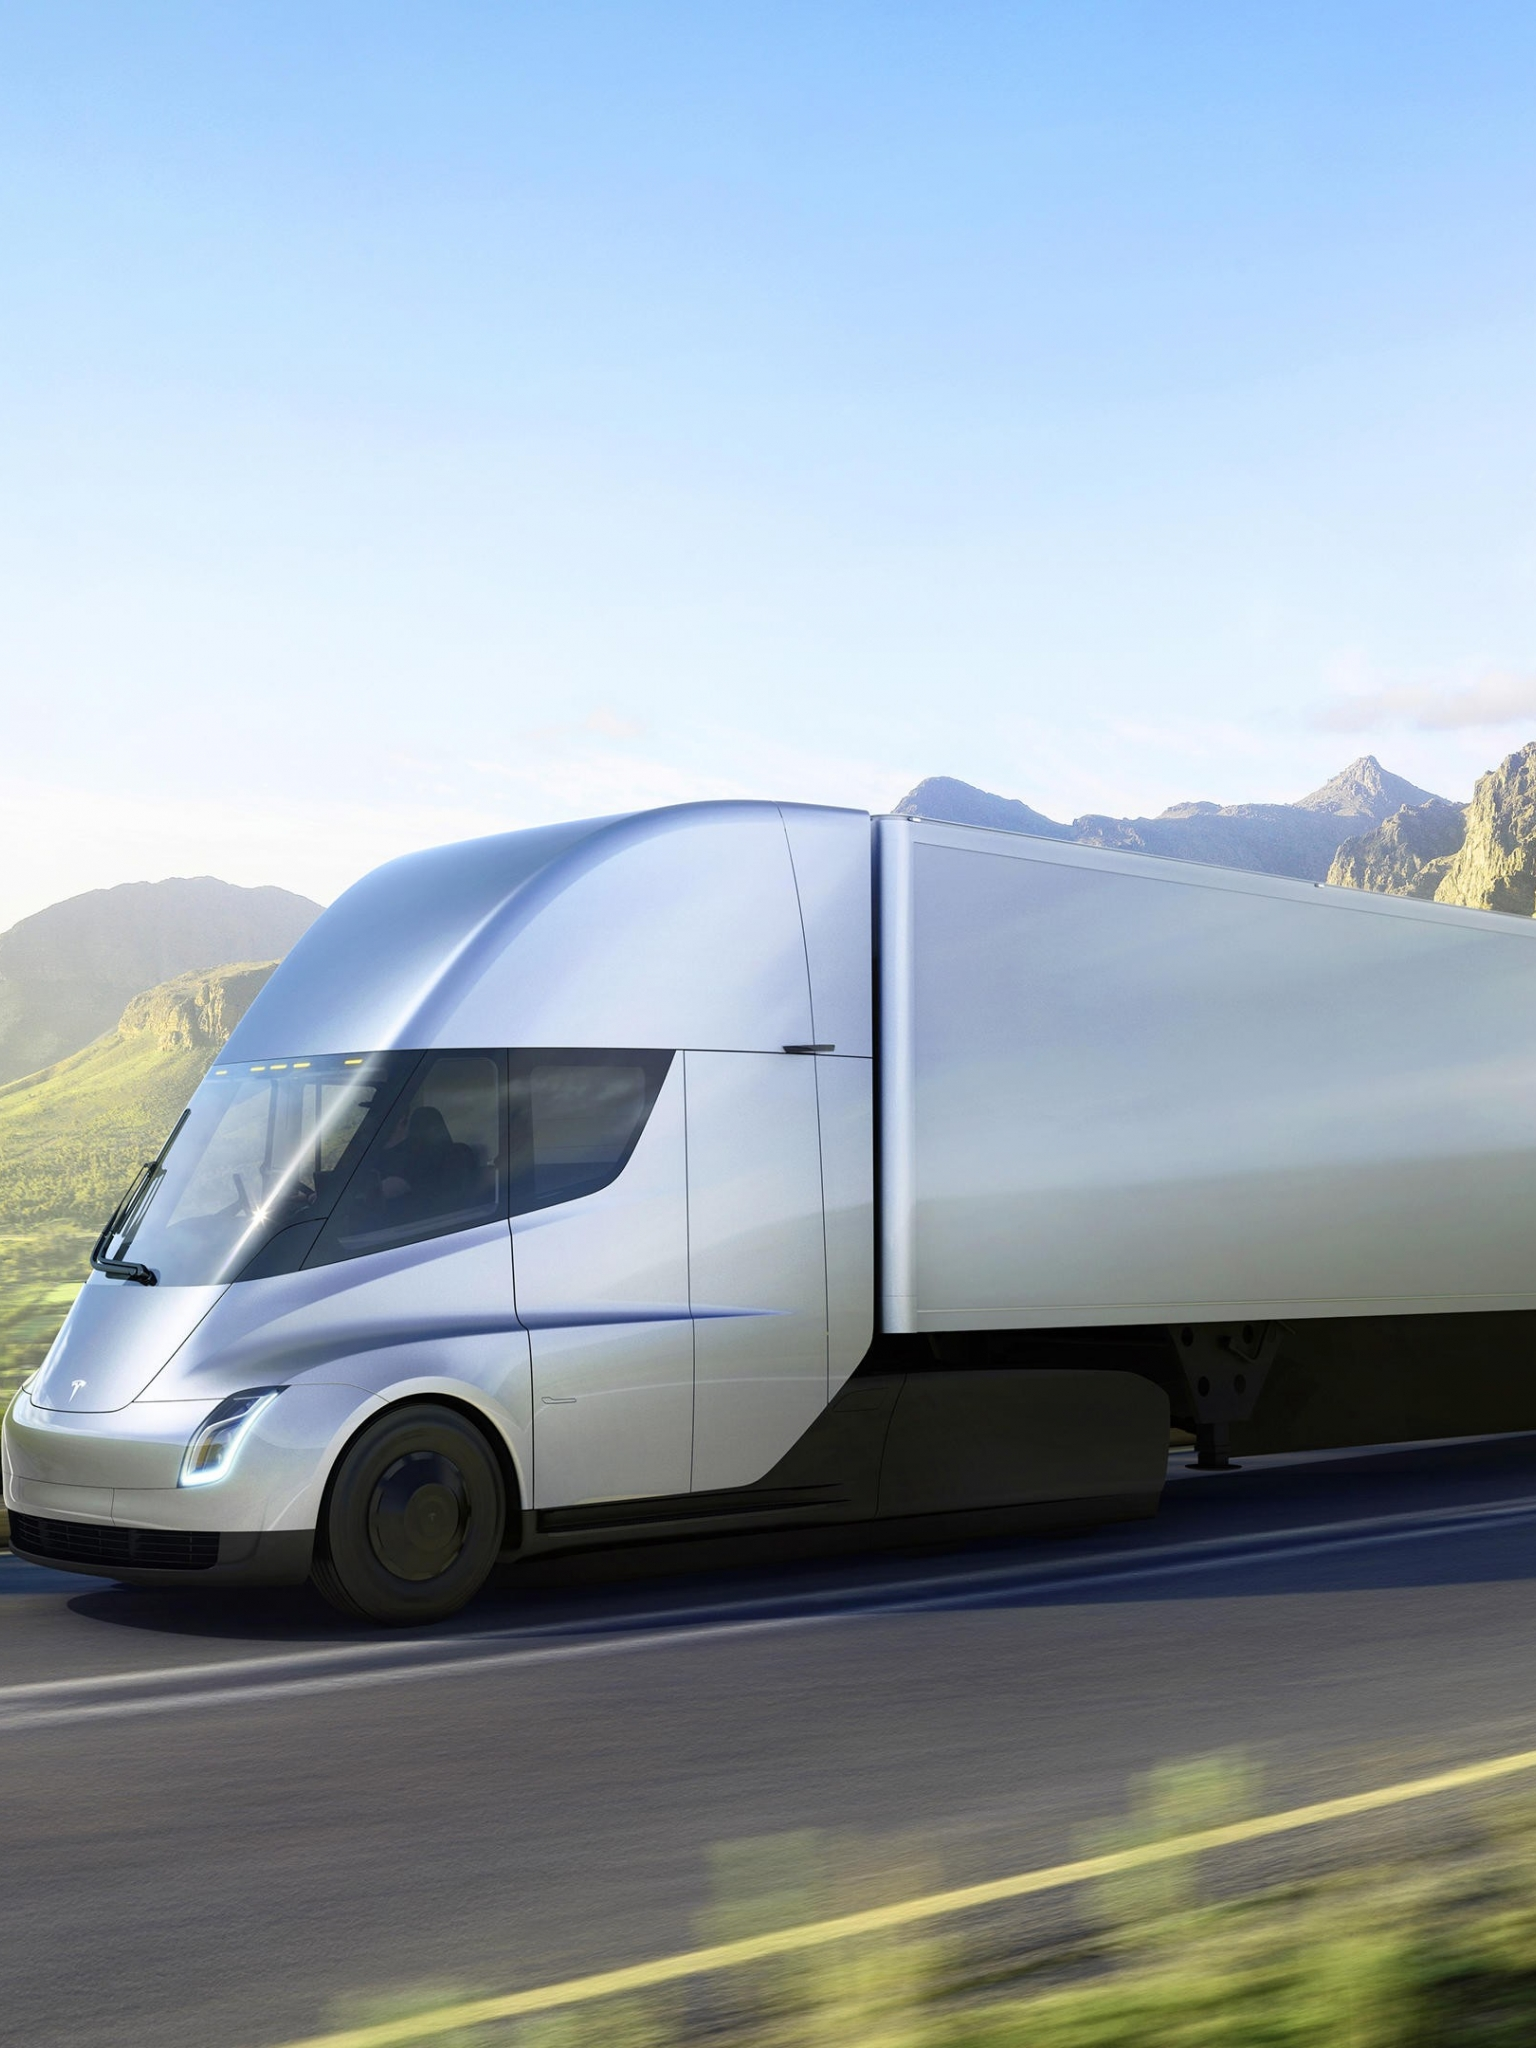 37+ Tesla Truck Wallpapers on WallpaperSafari